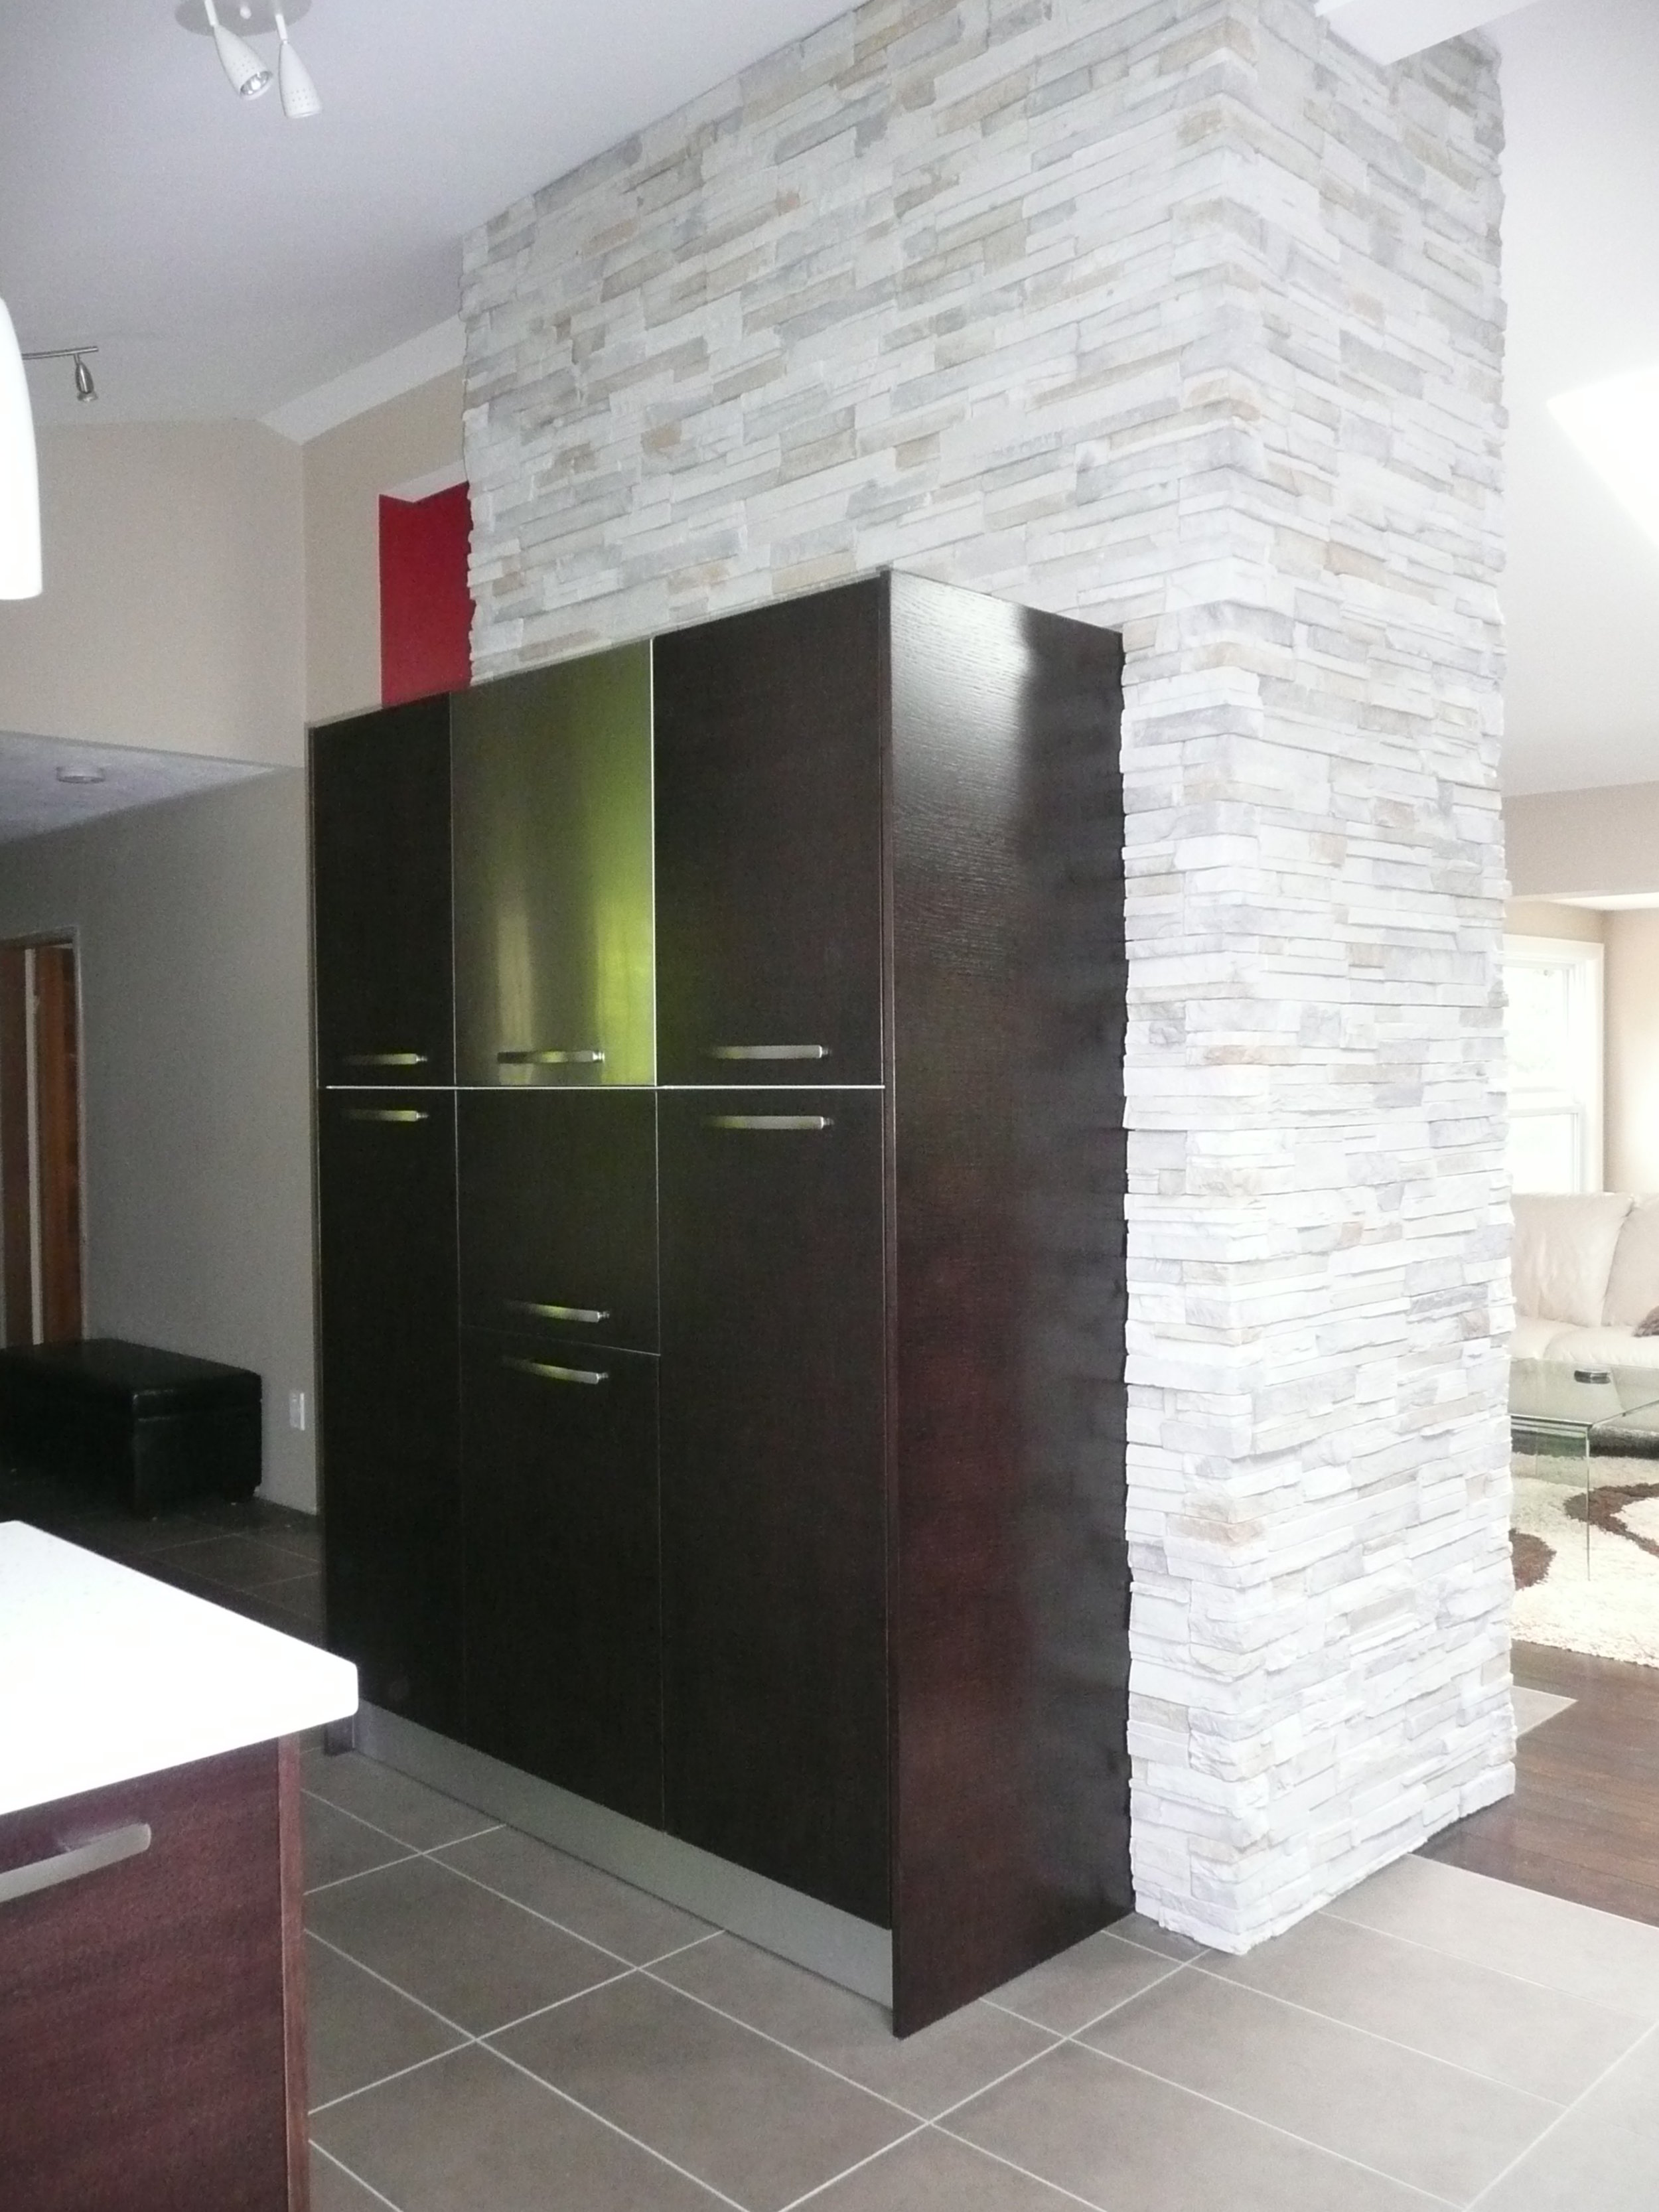 Kitchen 15 Pic 4.JPG